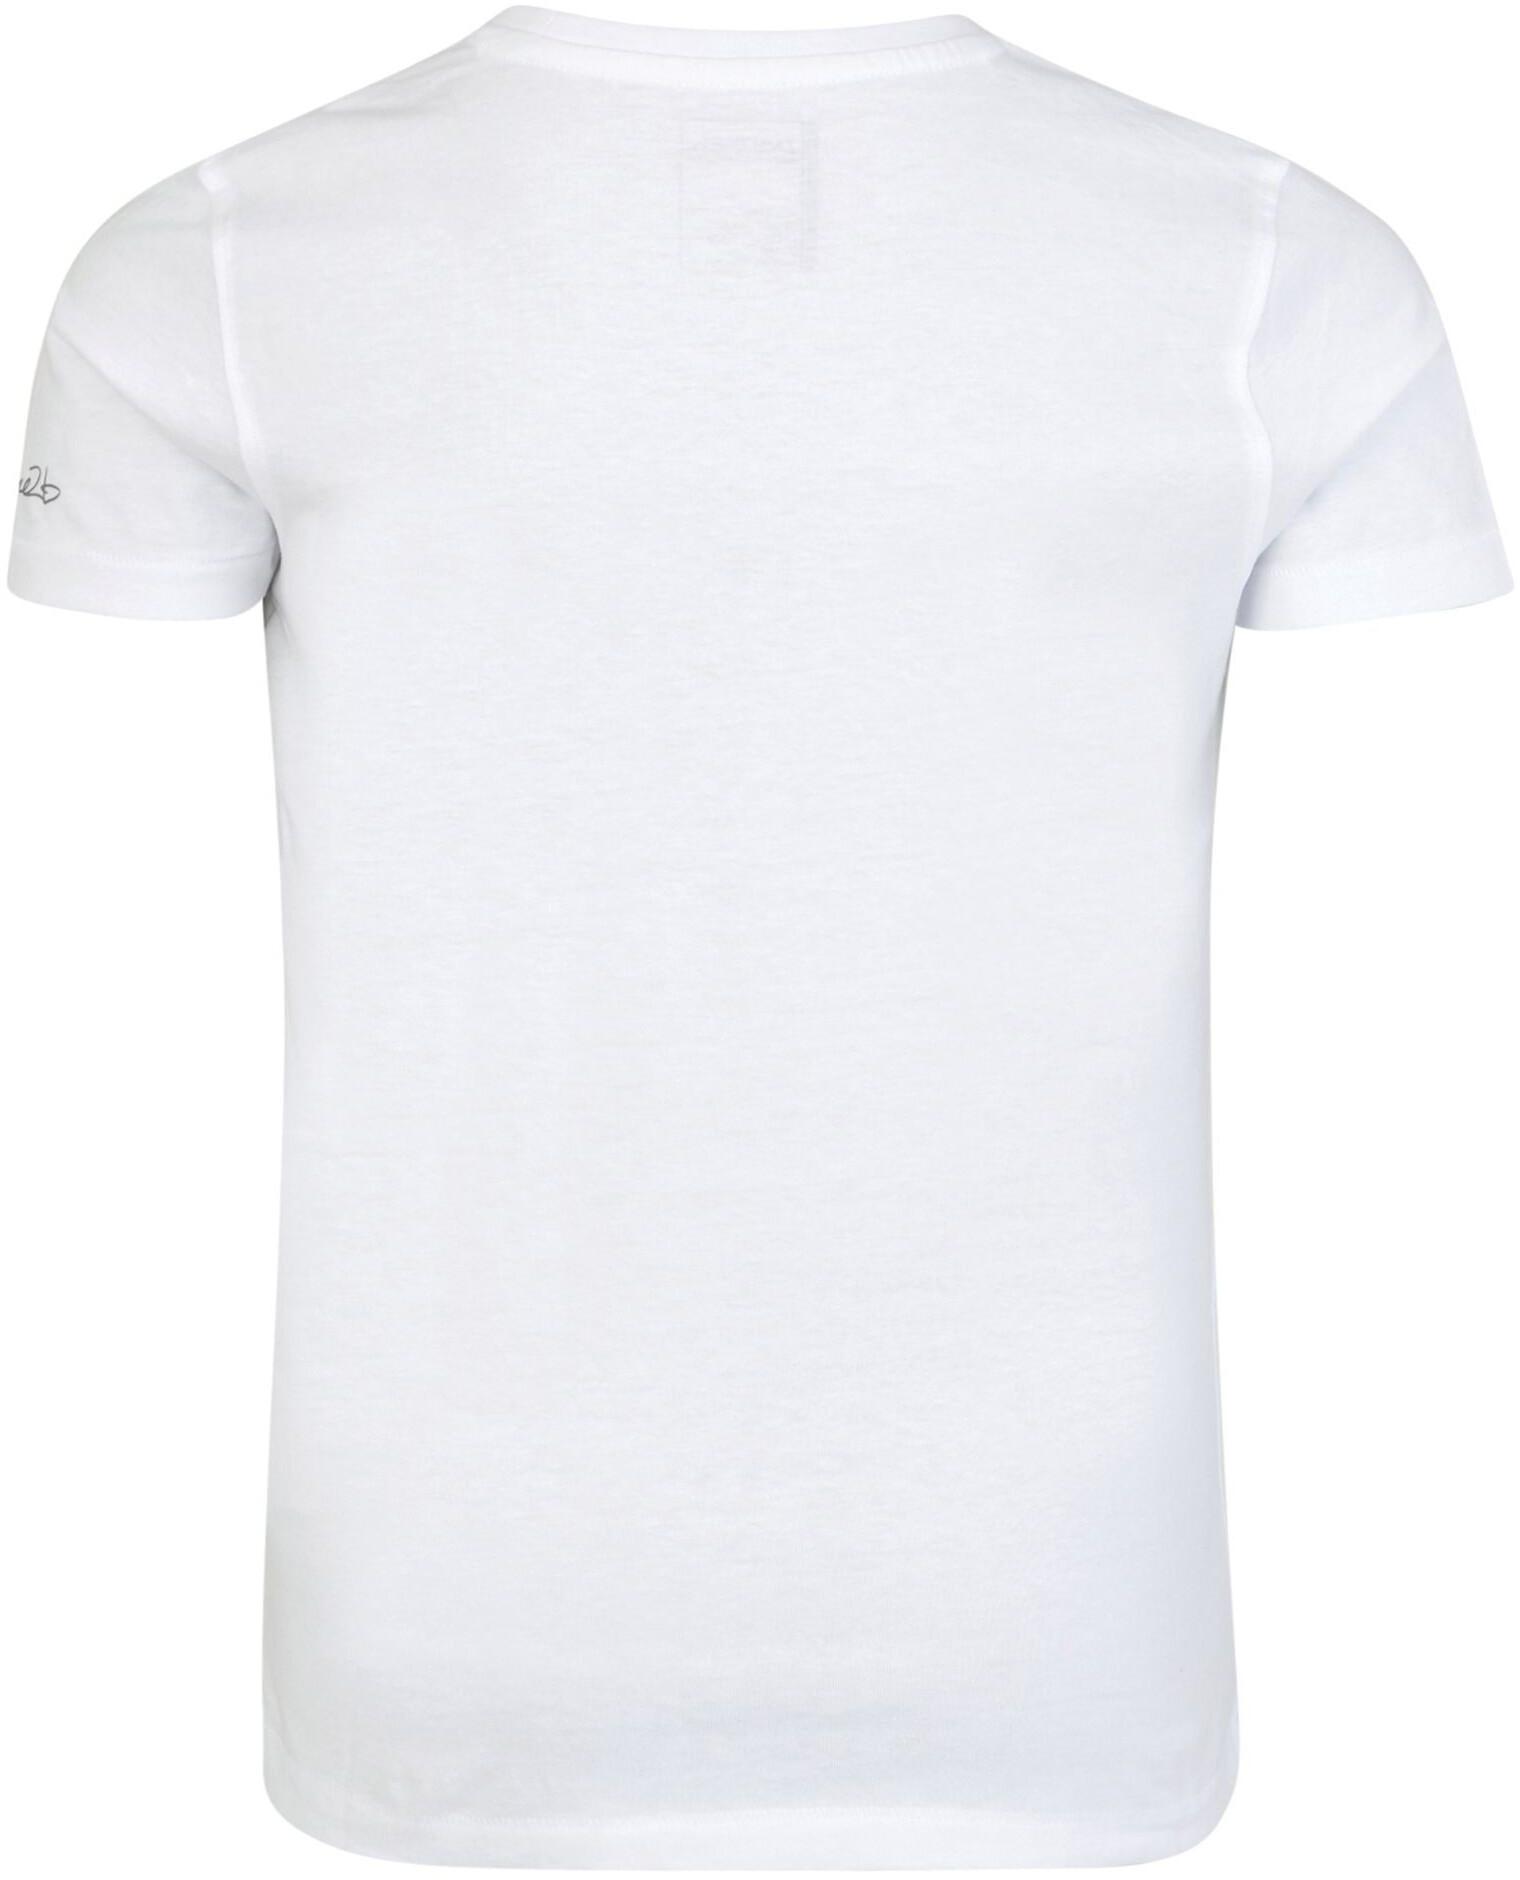 f863b5ba3 Dare 2b Ensemble - Camiseta manga corta Niños - blanco